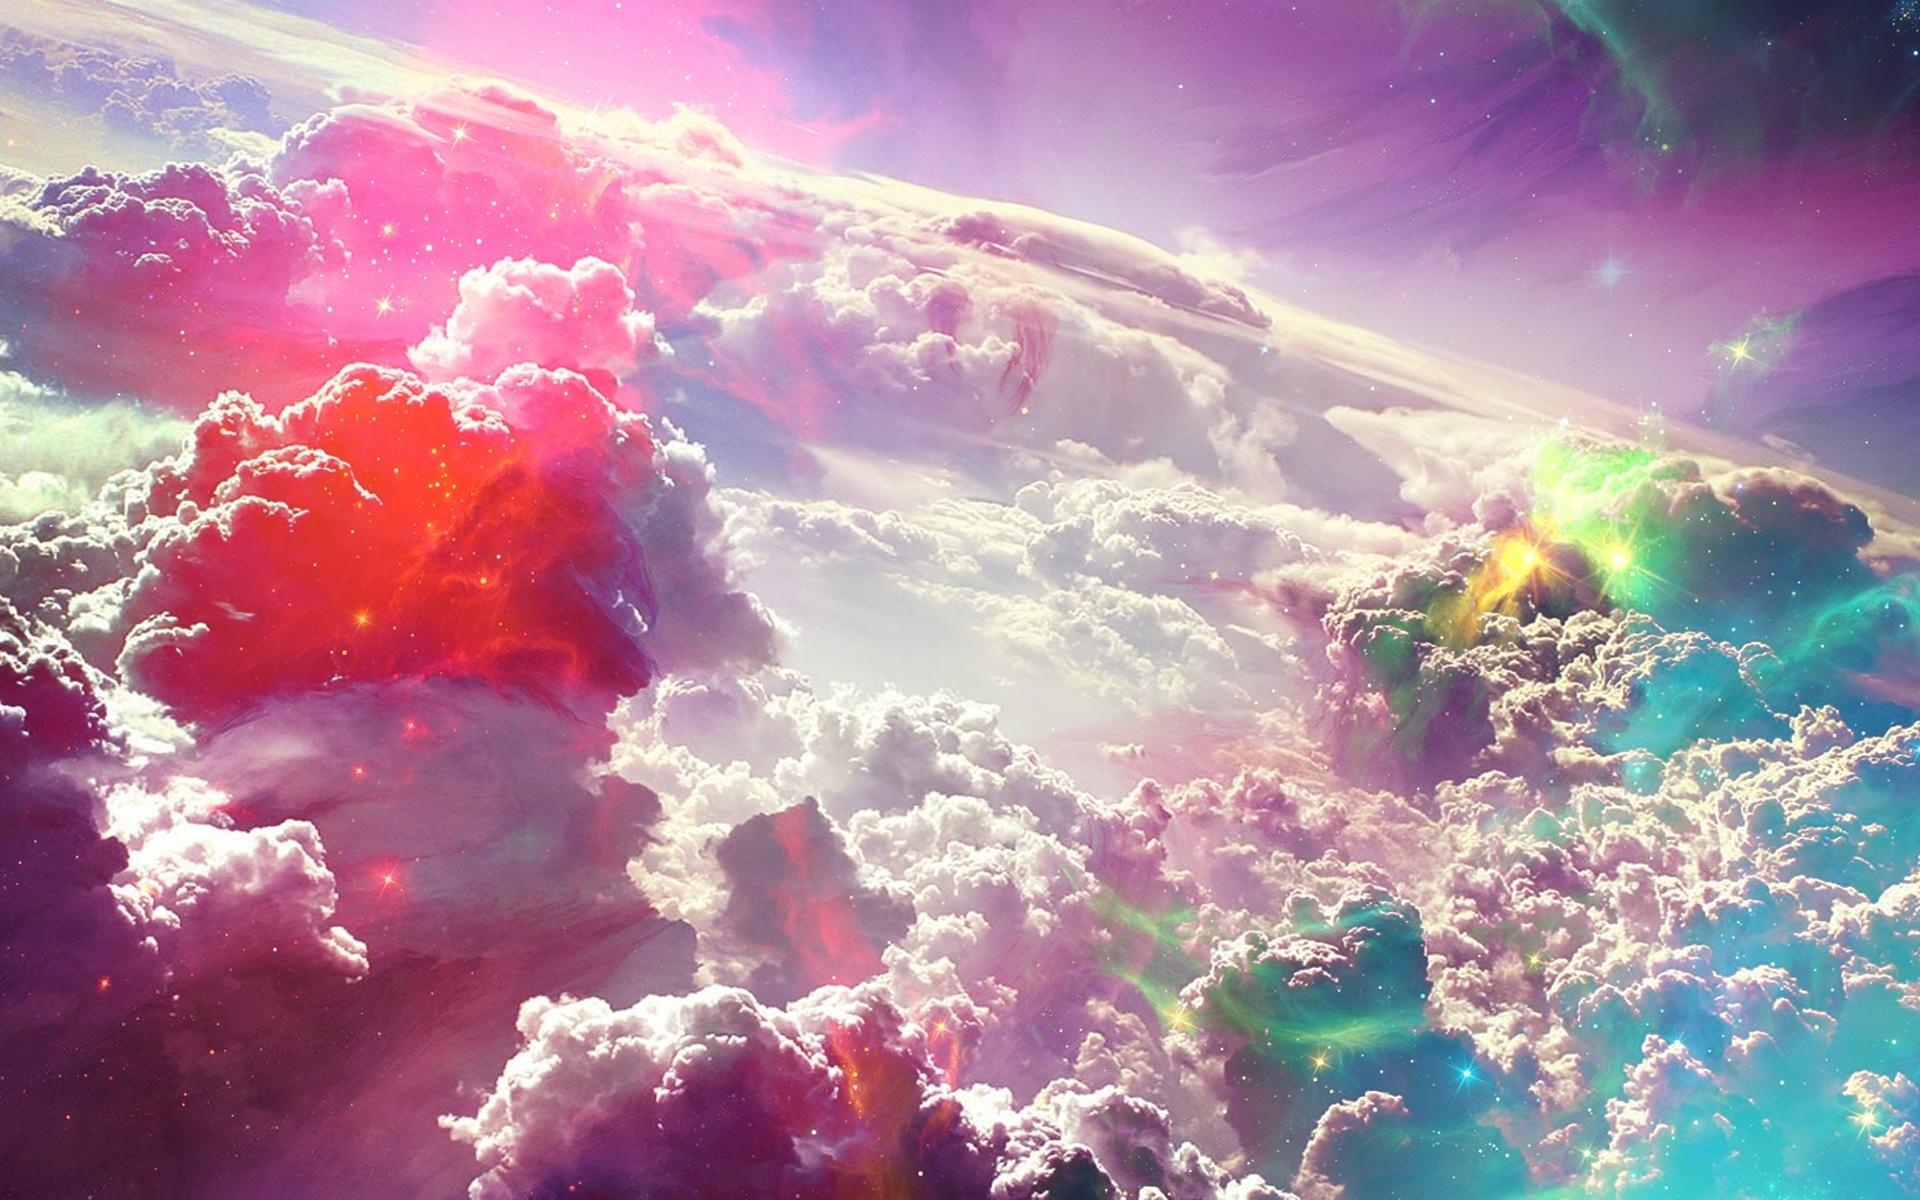 Colorful Fantasy Clouds Art HD Wallpaper 1920x1200